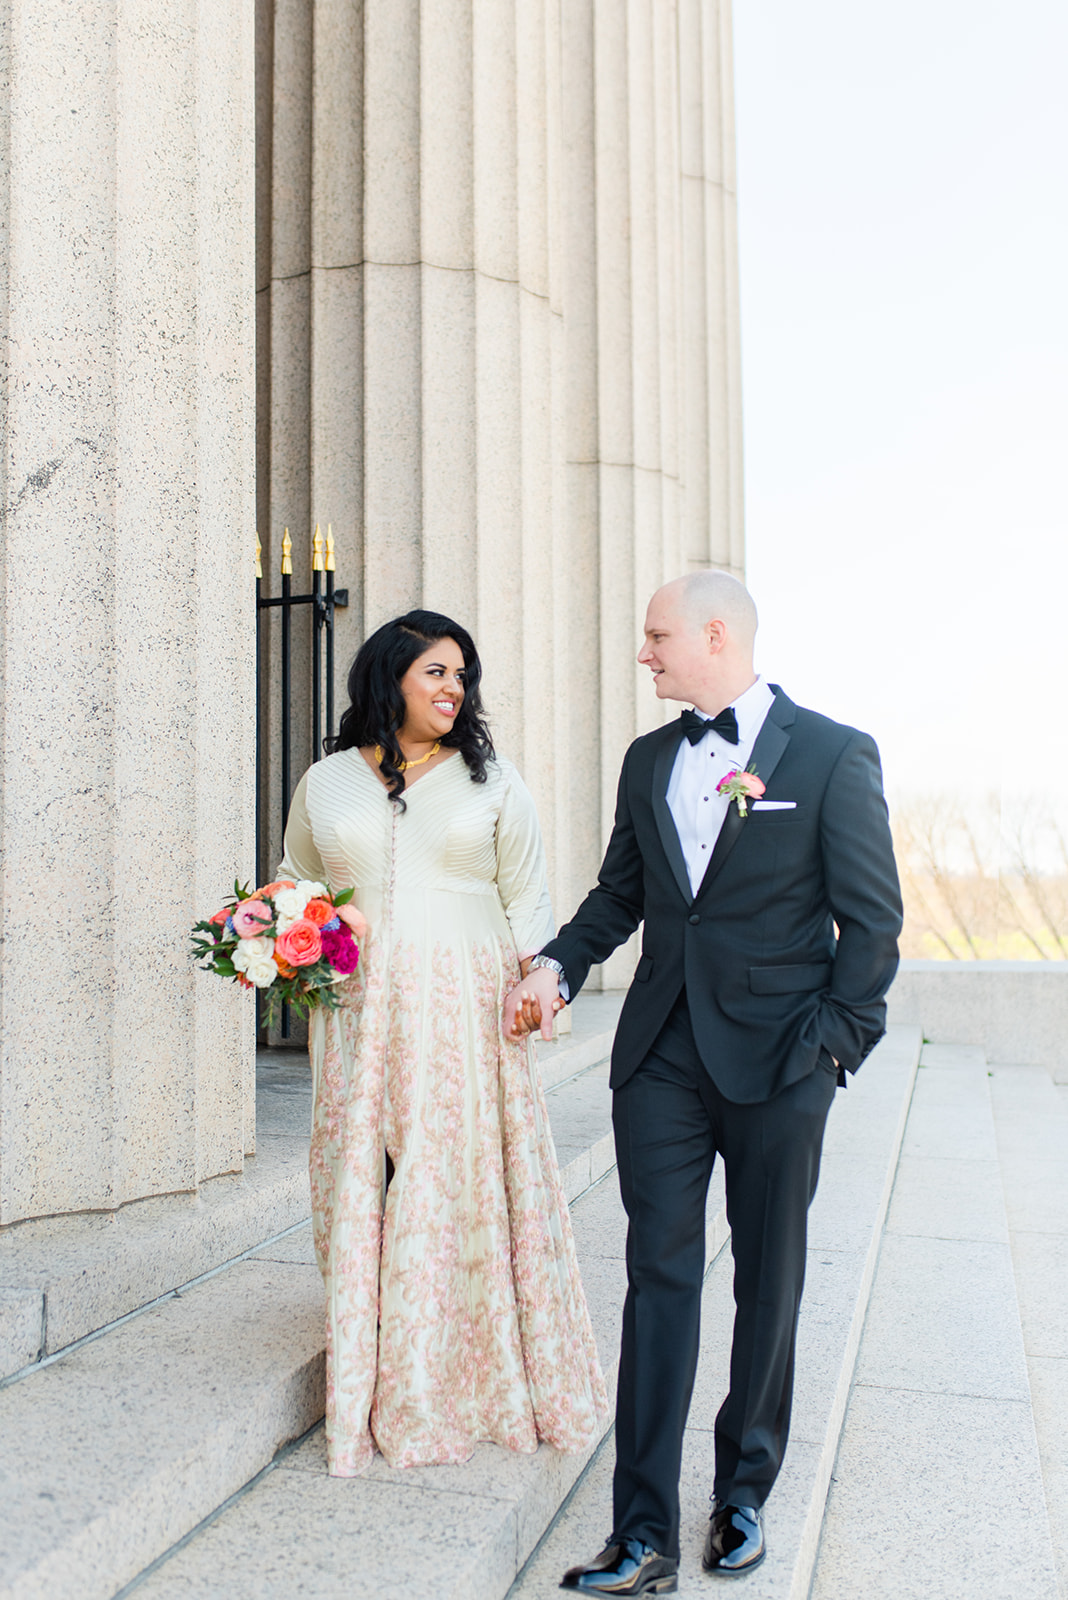 Maya&Darian-WeddingDaySneakPeeks-068_websize.jpg